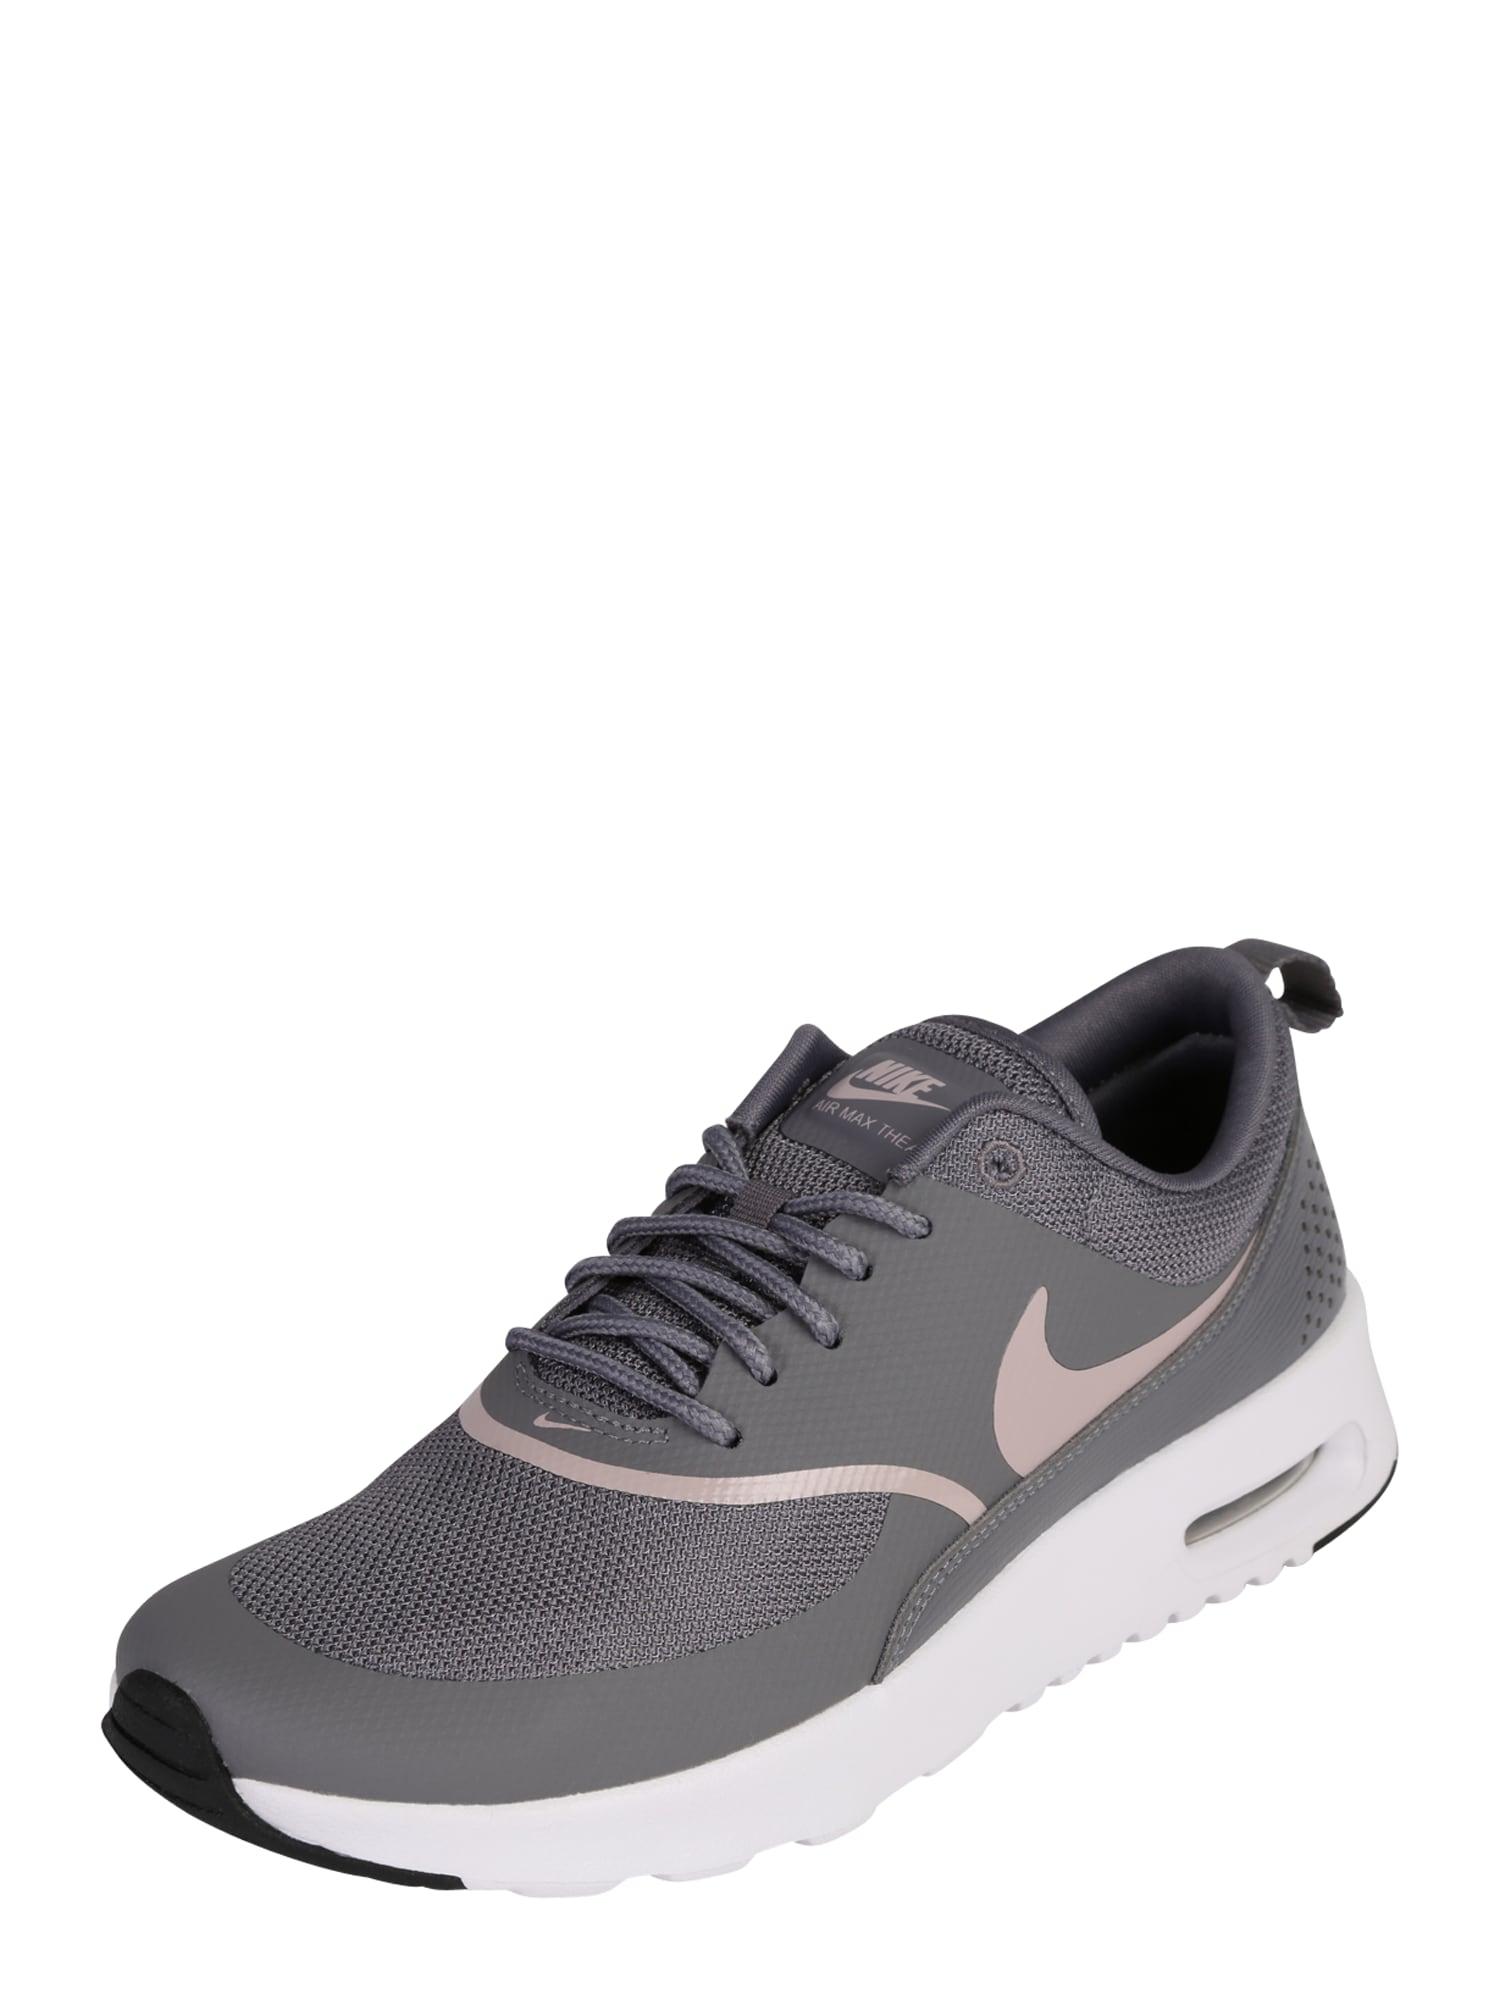 Nike Sportswear, Dames Sneakers laag 'AIR MAX THEA', grijs / rosa